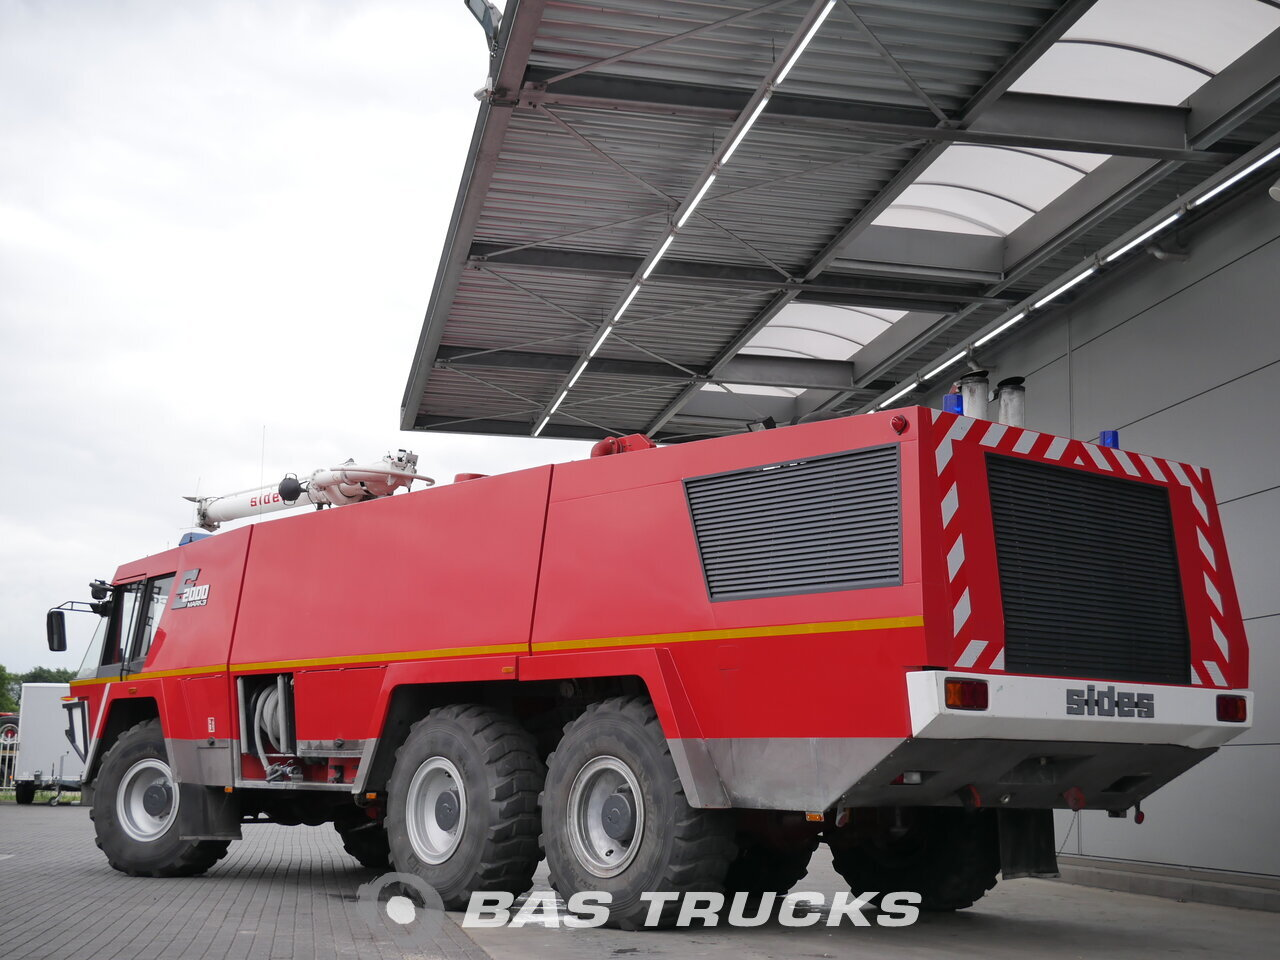 mercedes crashtender sides airport fire truck truck bas trucks. Black Bedroom Furniture Sets. Home Design Ideas